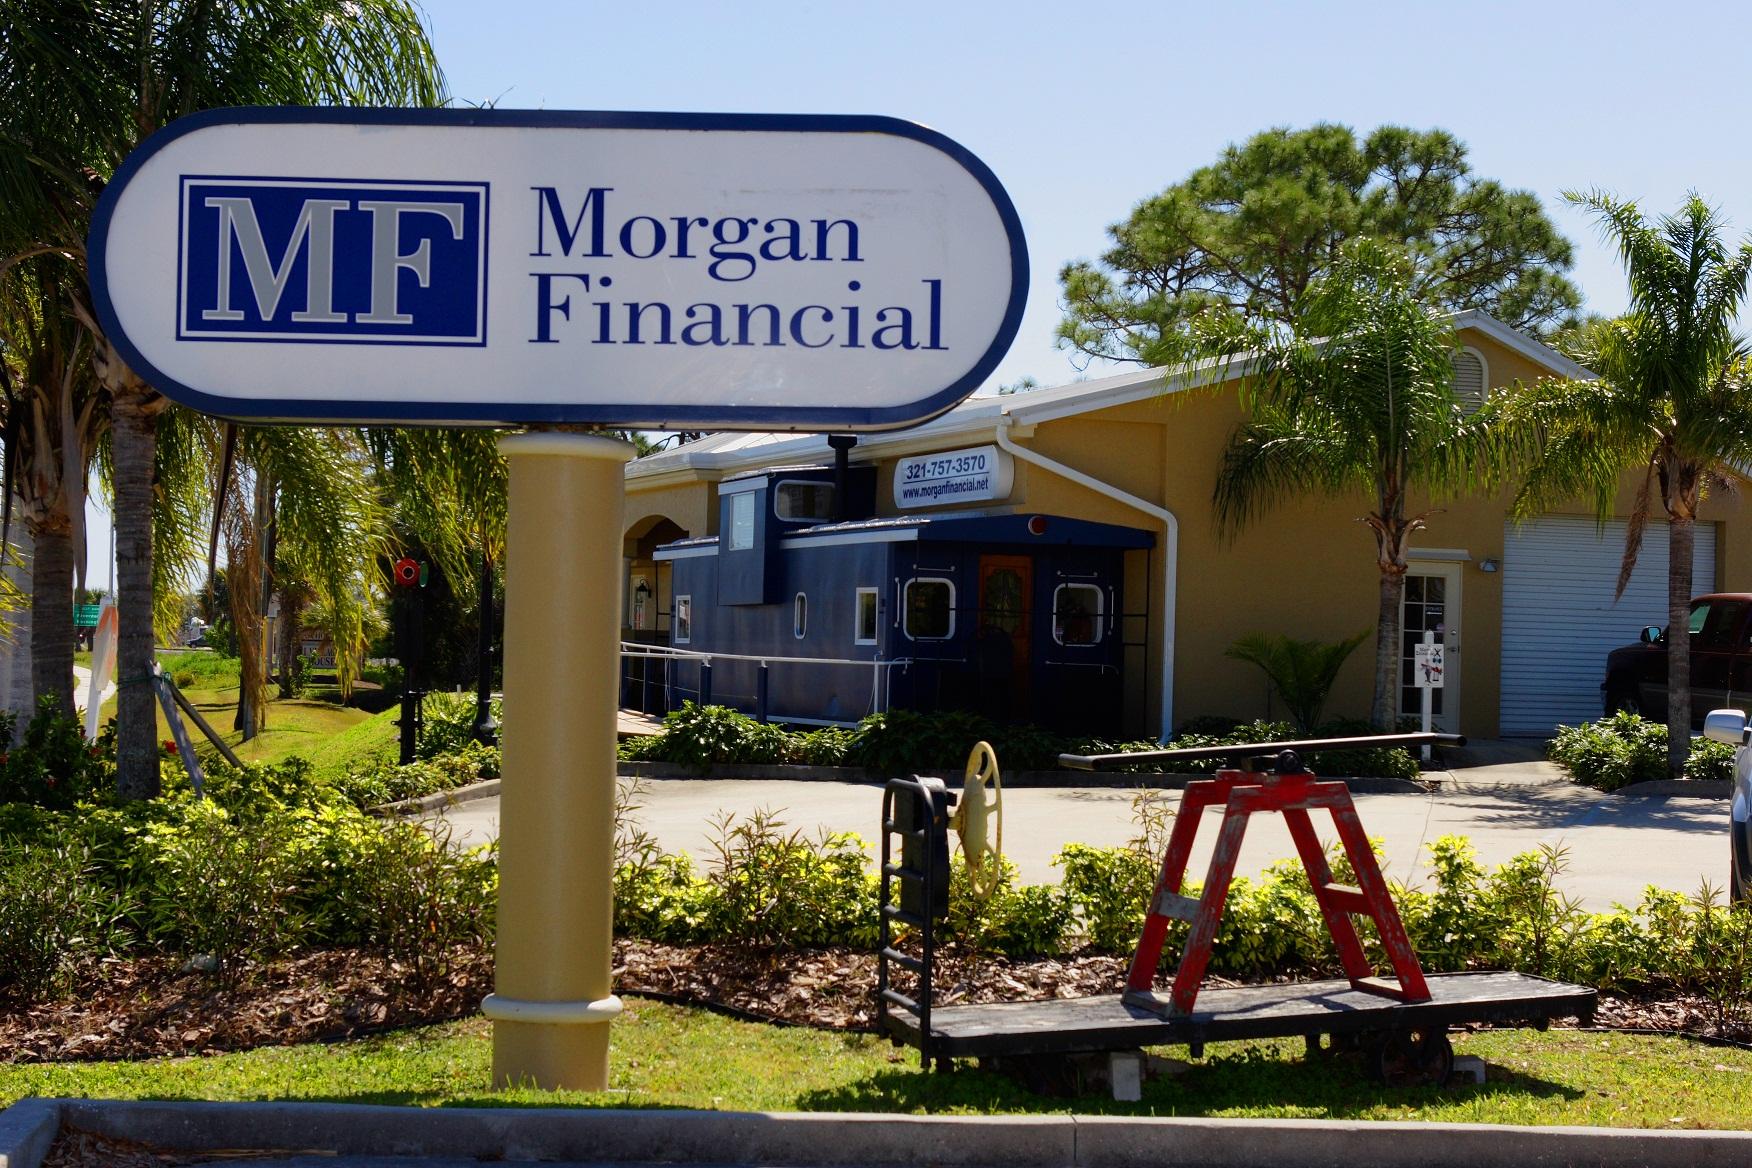 History of Morgan Financial: The Caboose